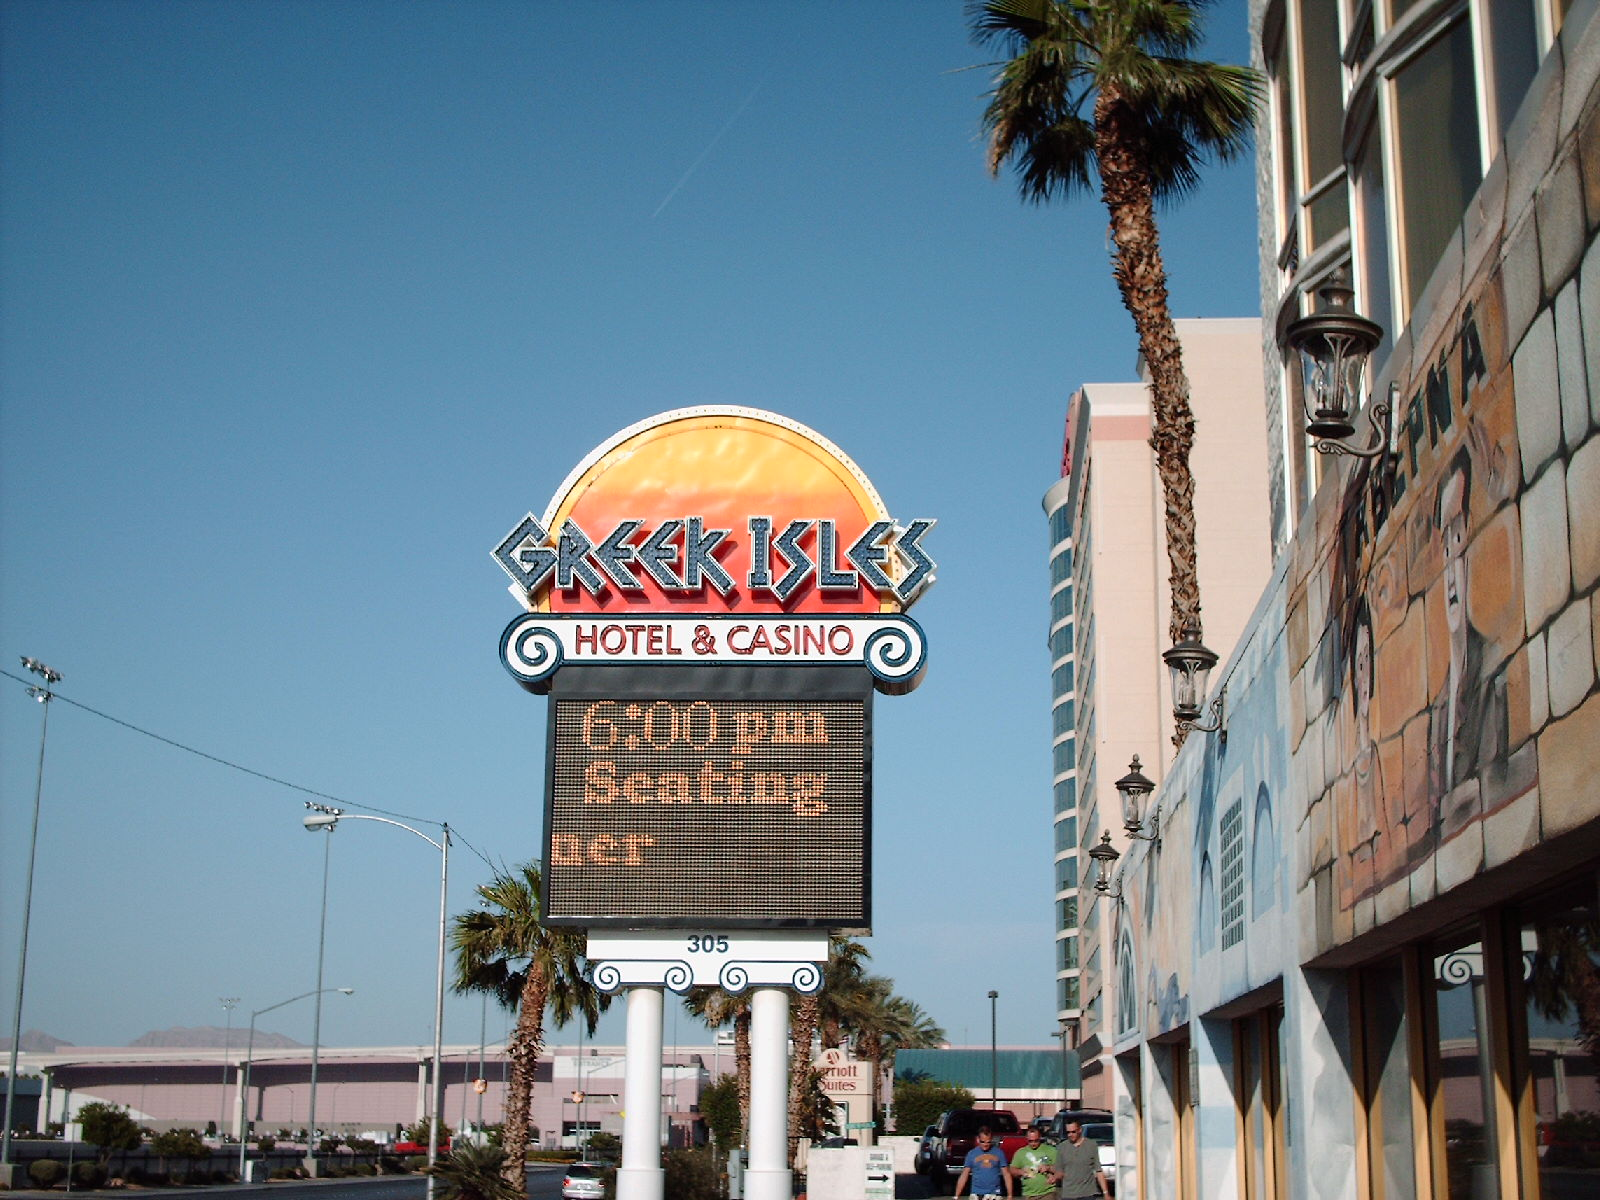 Fiesta henderson casino hotel 13